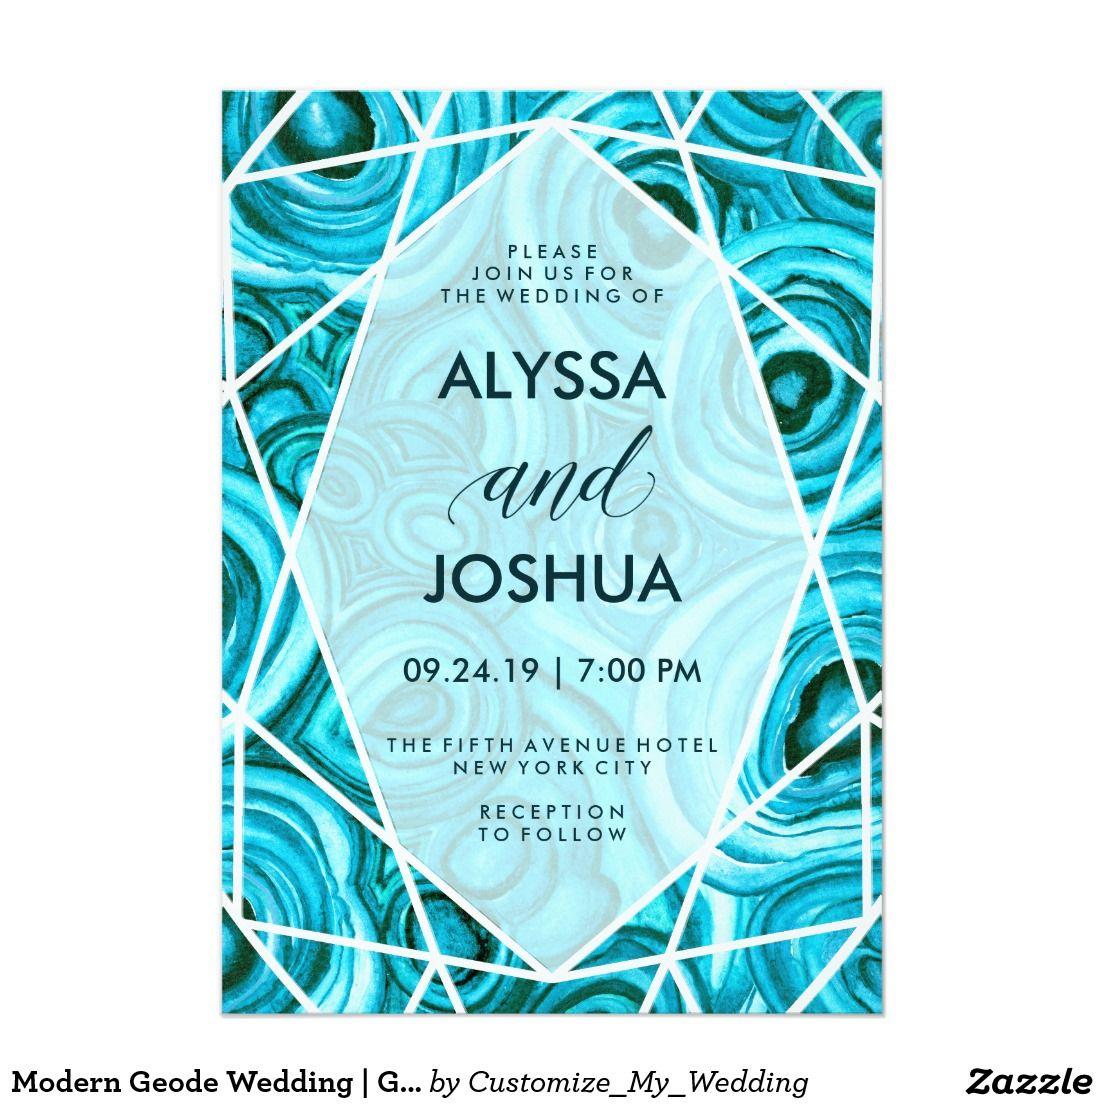 Modern Geode Wedding | Geometric Turquoise Blue Malachite Invitation